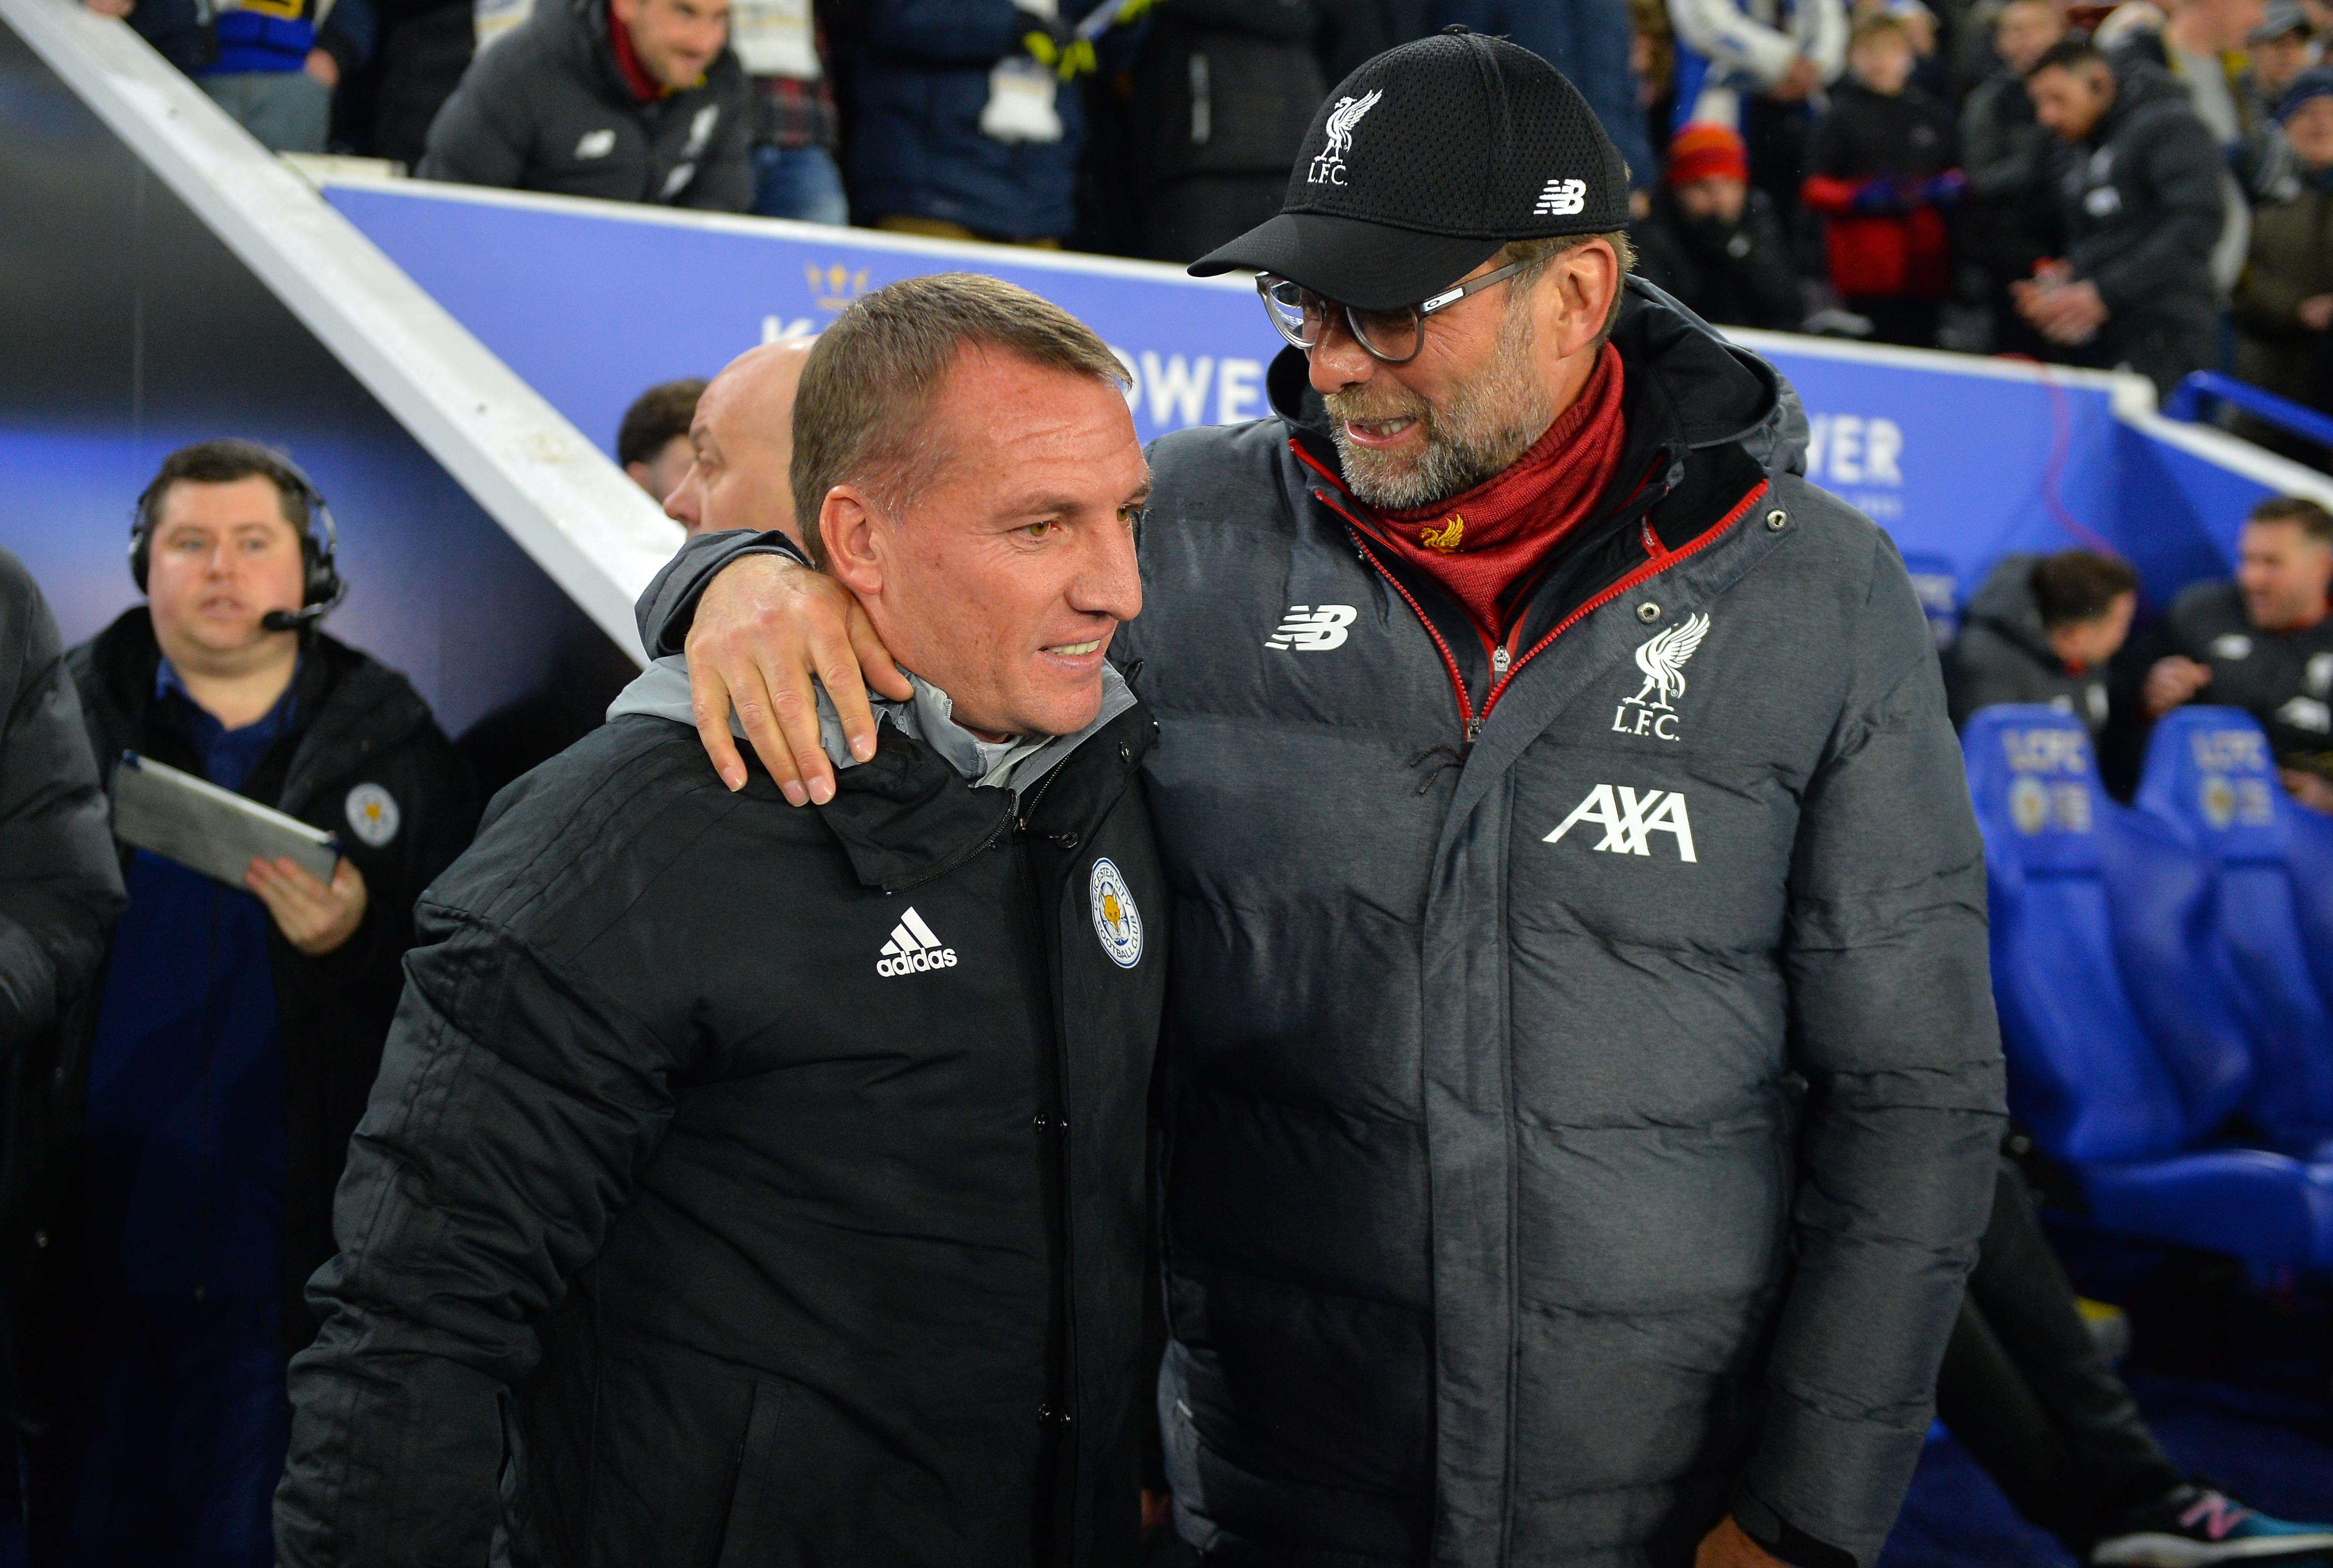 Brendan Rodgers will look to get one over his Liverpool successor, Jurgen Klopp, this weekend